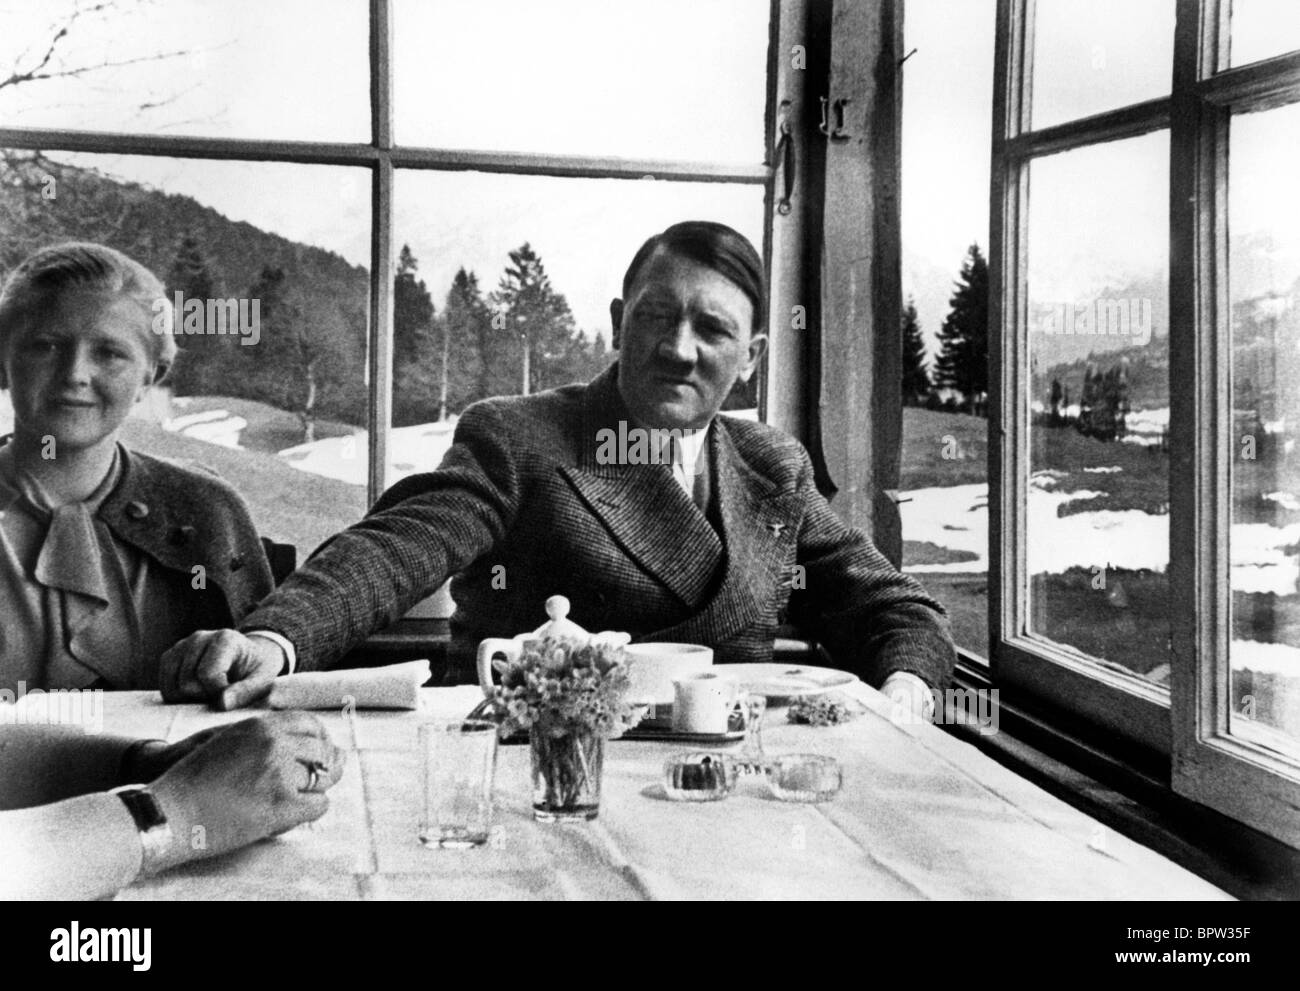 ADOLF HITLER NAZI LEADER 01 May 1940 Stock Photo